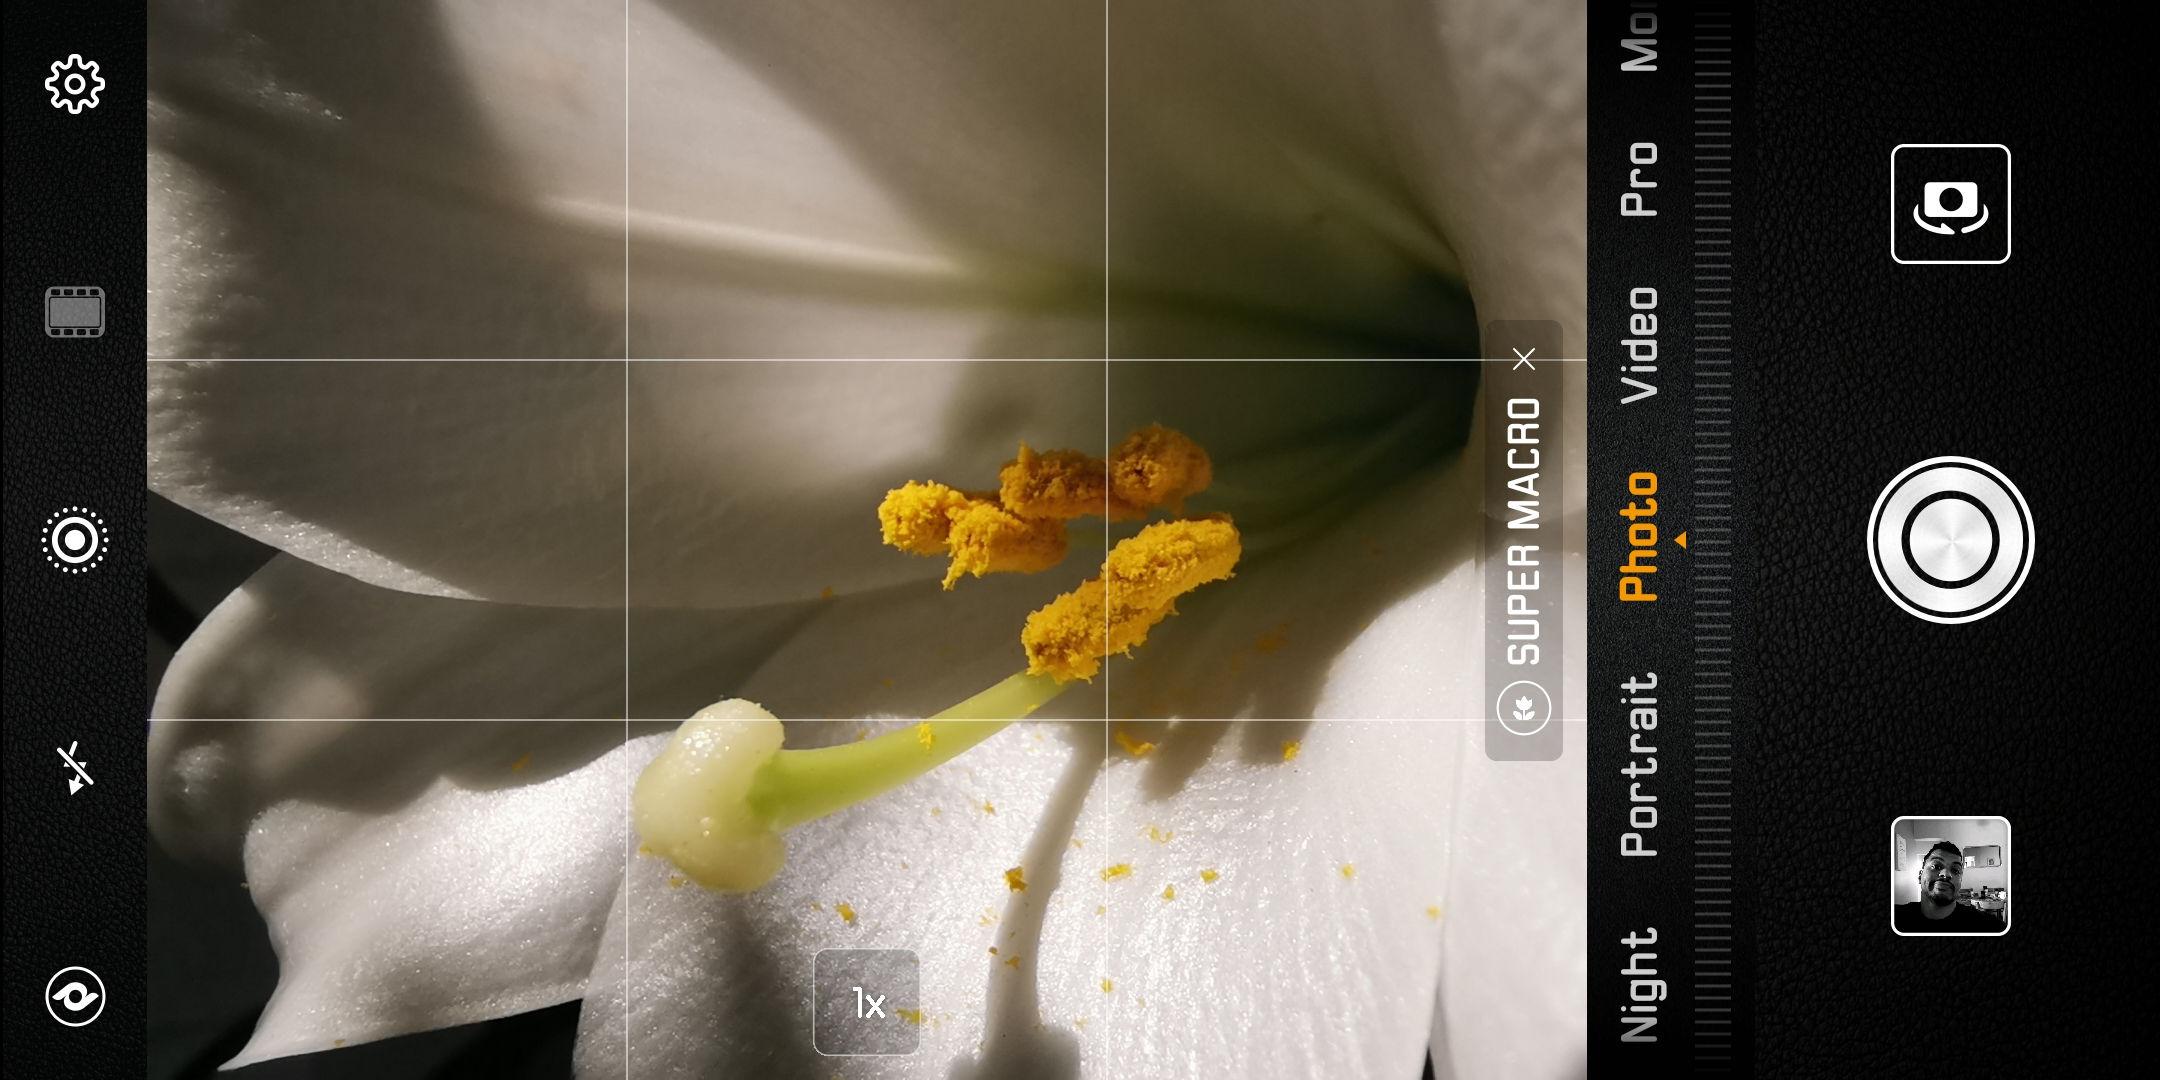 The Huawei Mate 20 Pro camera app.